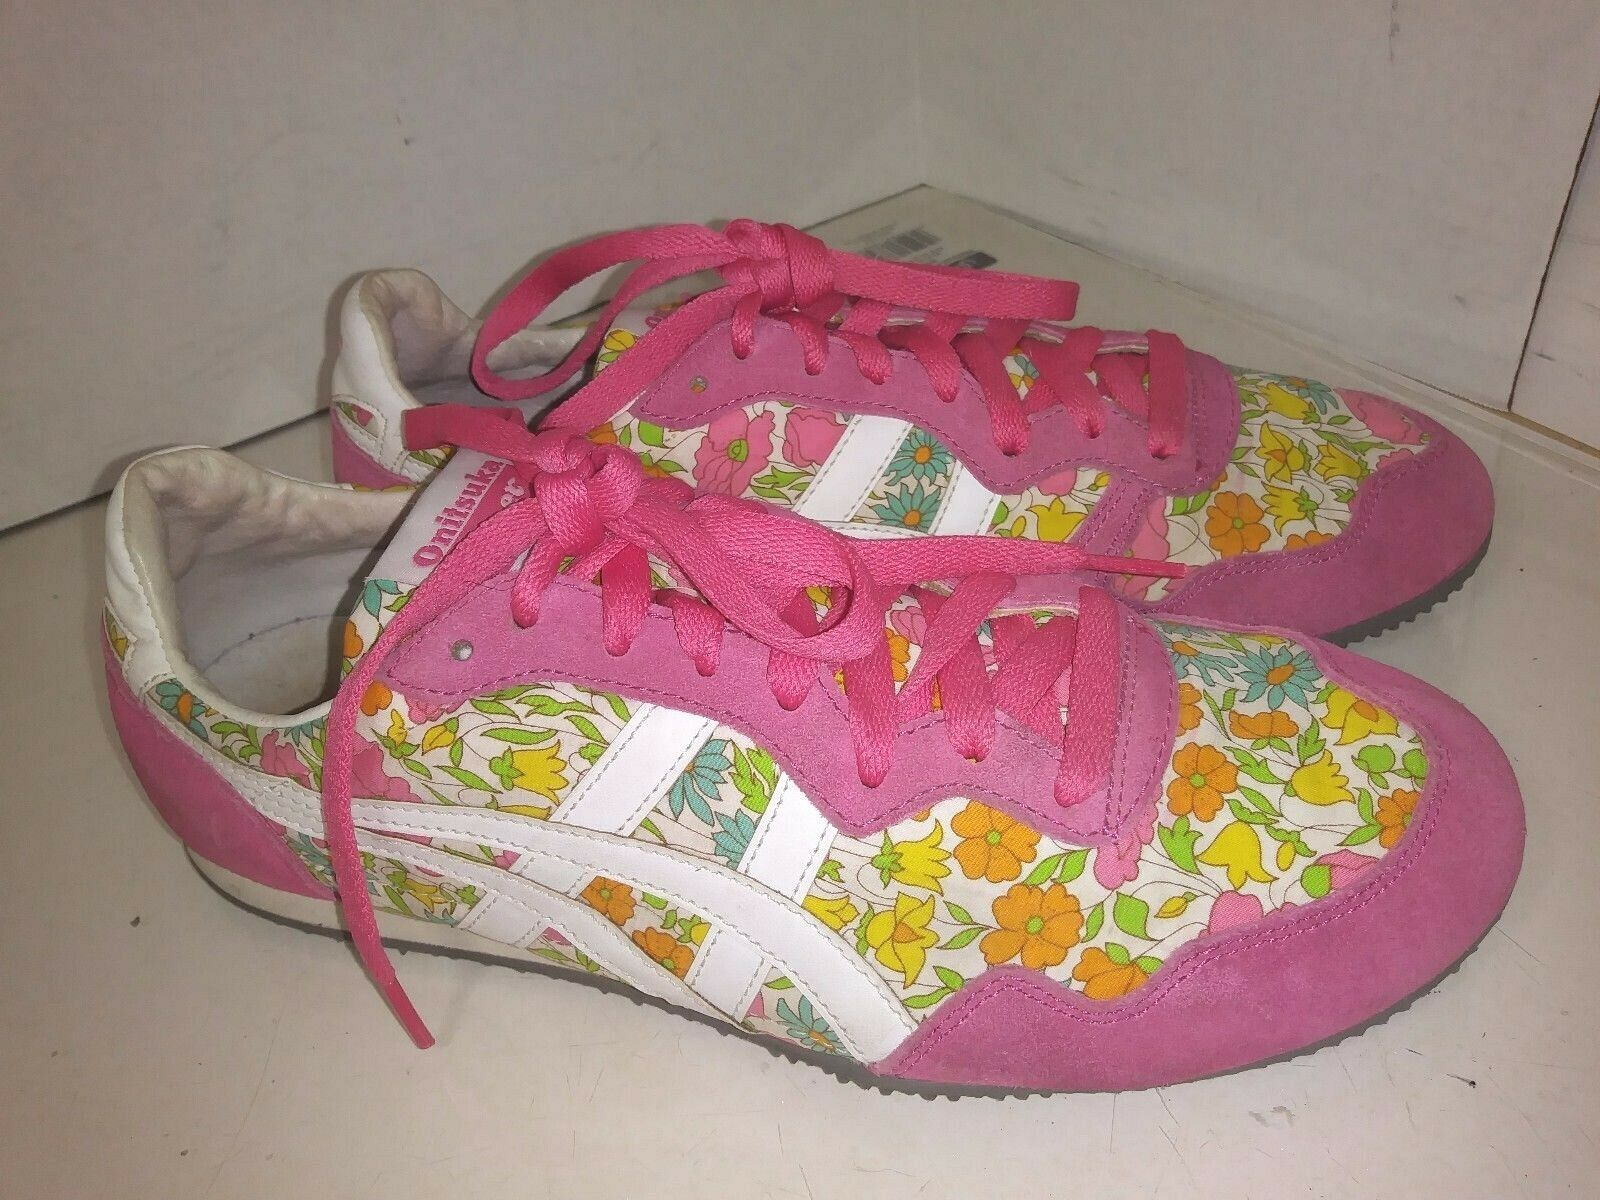 Asics Serrano Pink Flower sneakers Womens Size 9  D2P6N